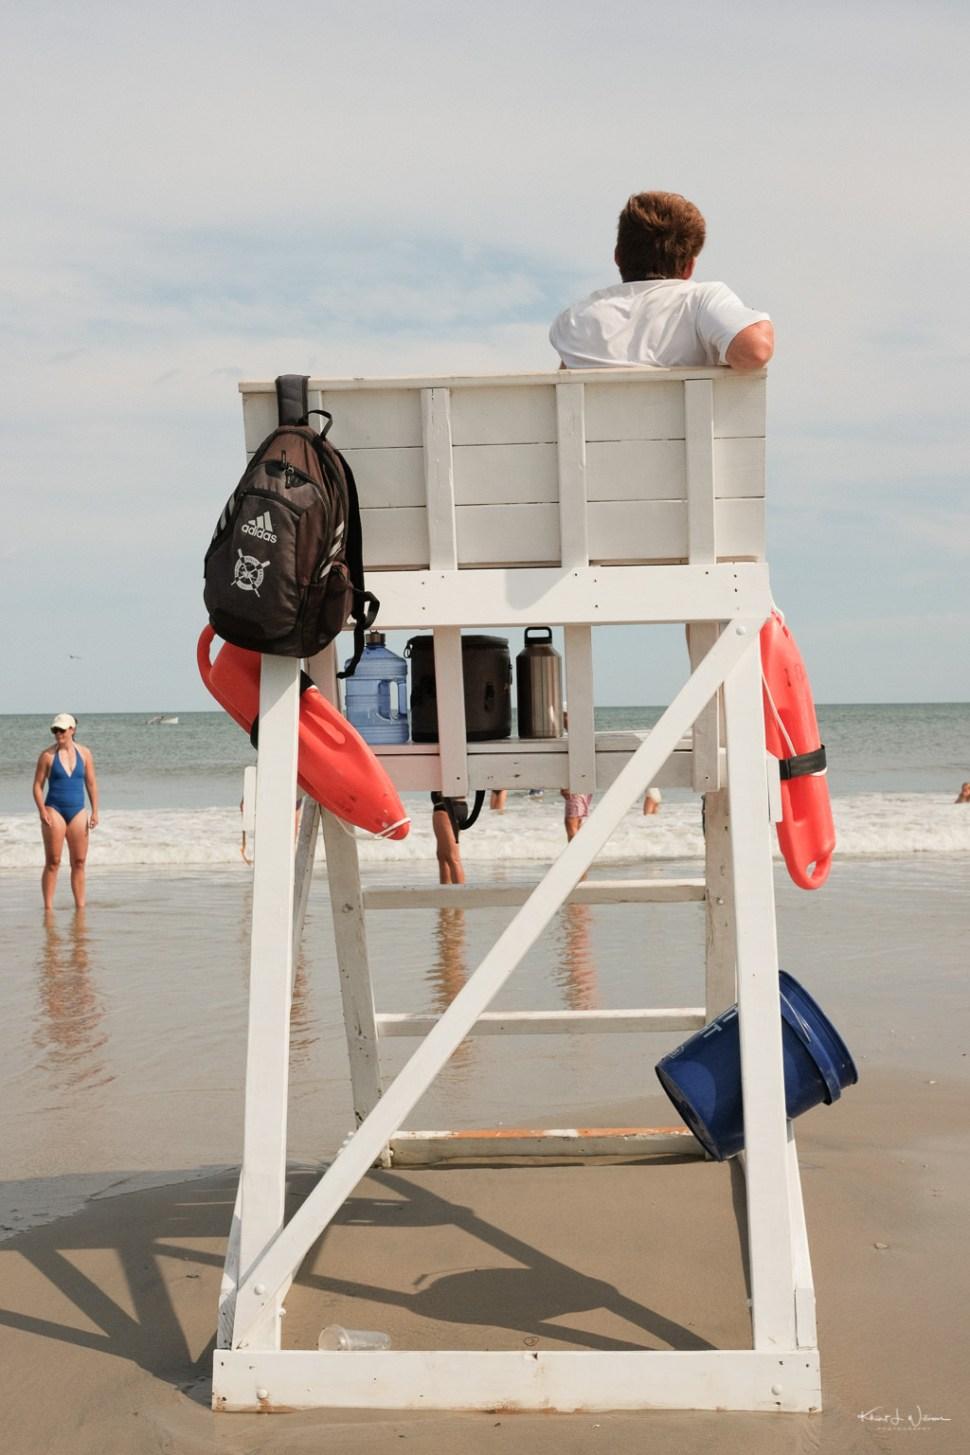 Life Guard Beach Scene